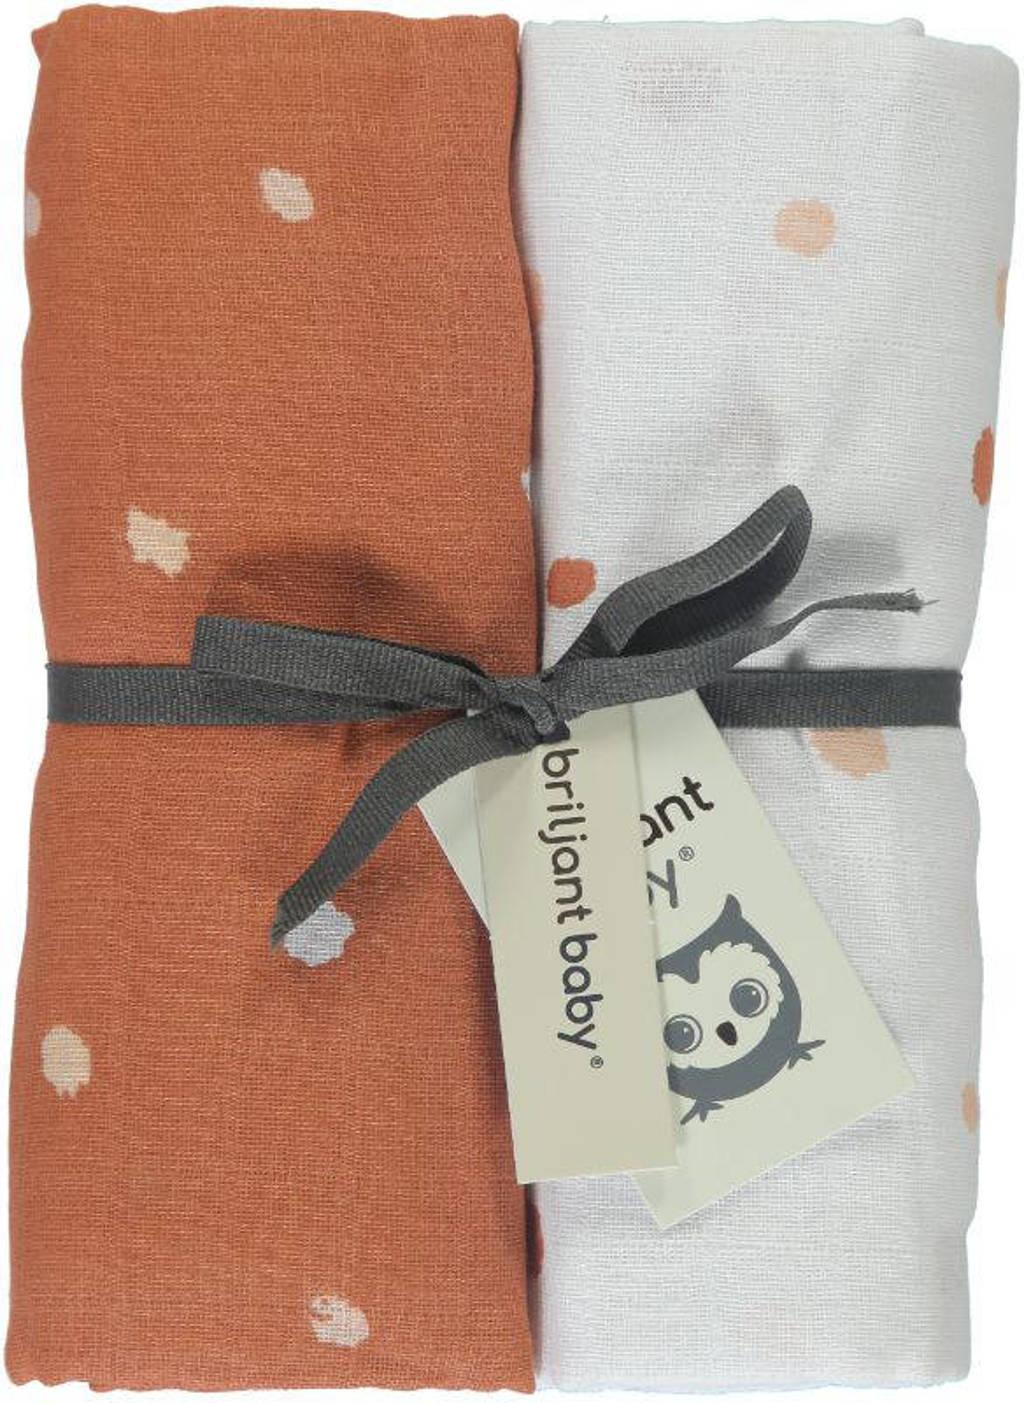 Briljant Baby Sunny hydrofiele luier - set van 2 120x120 cm stip terra/wit, Terra/wit